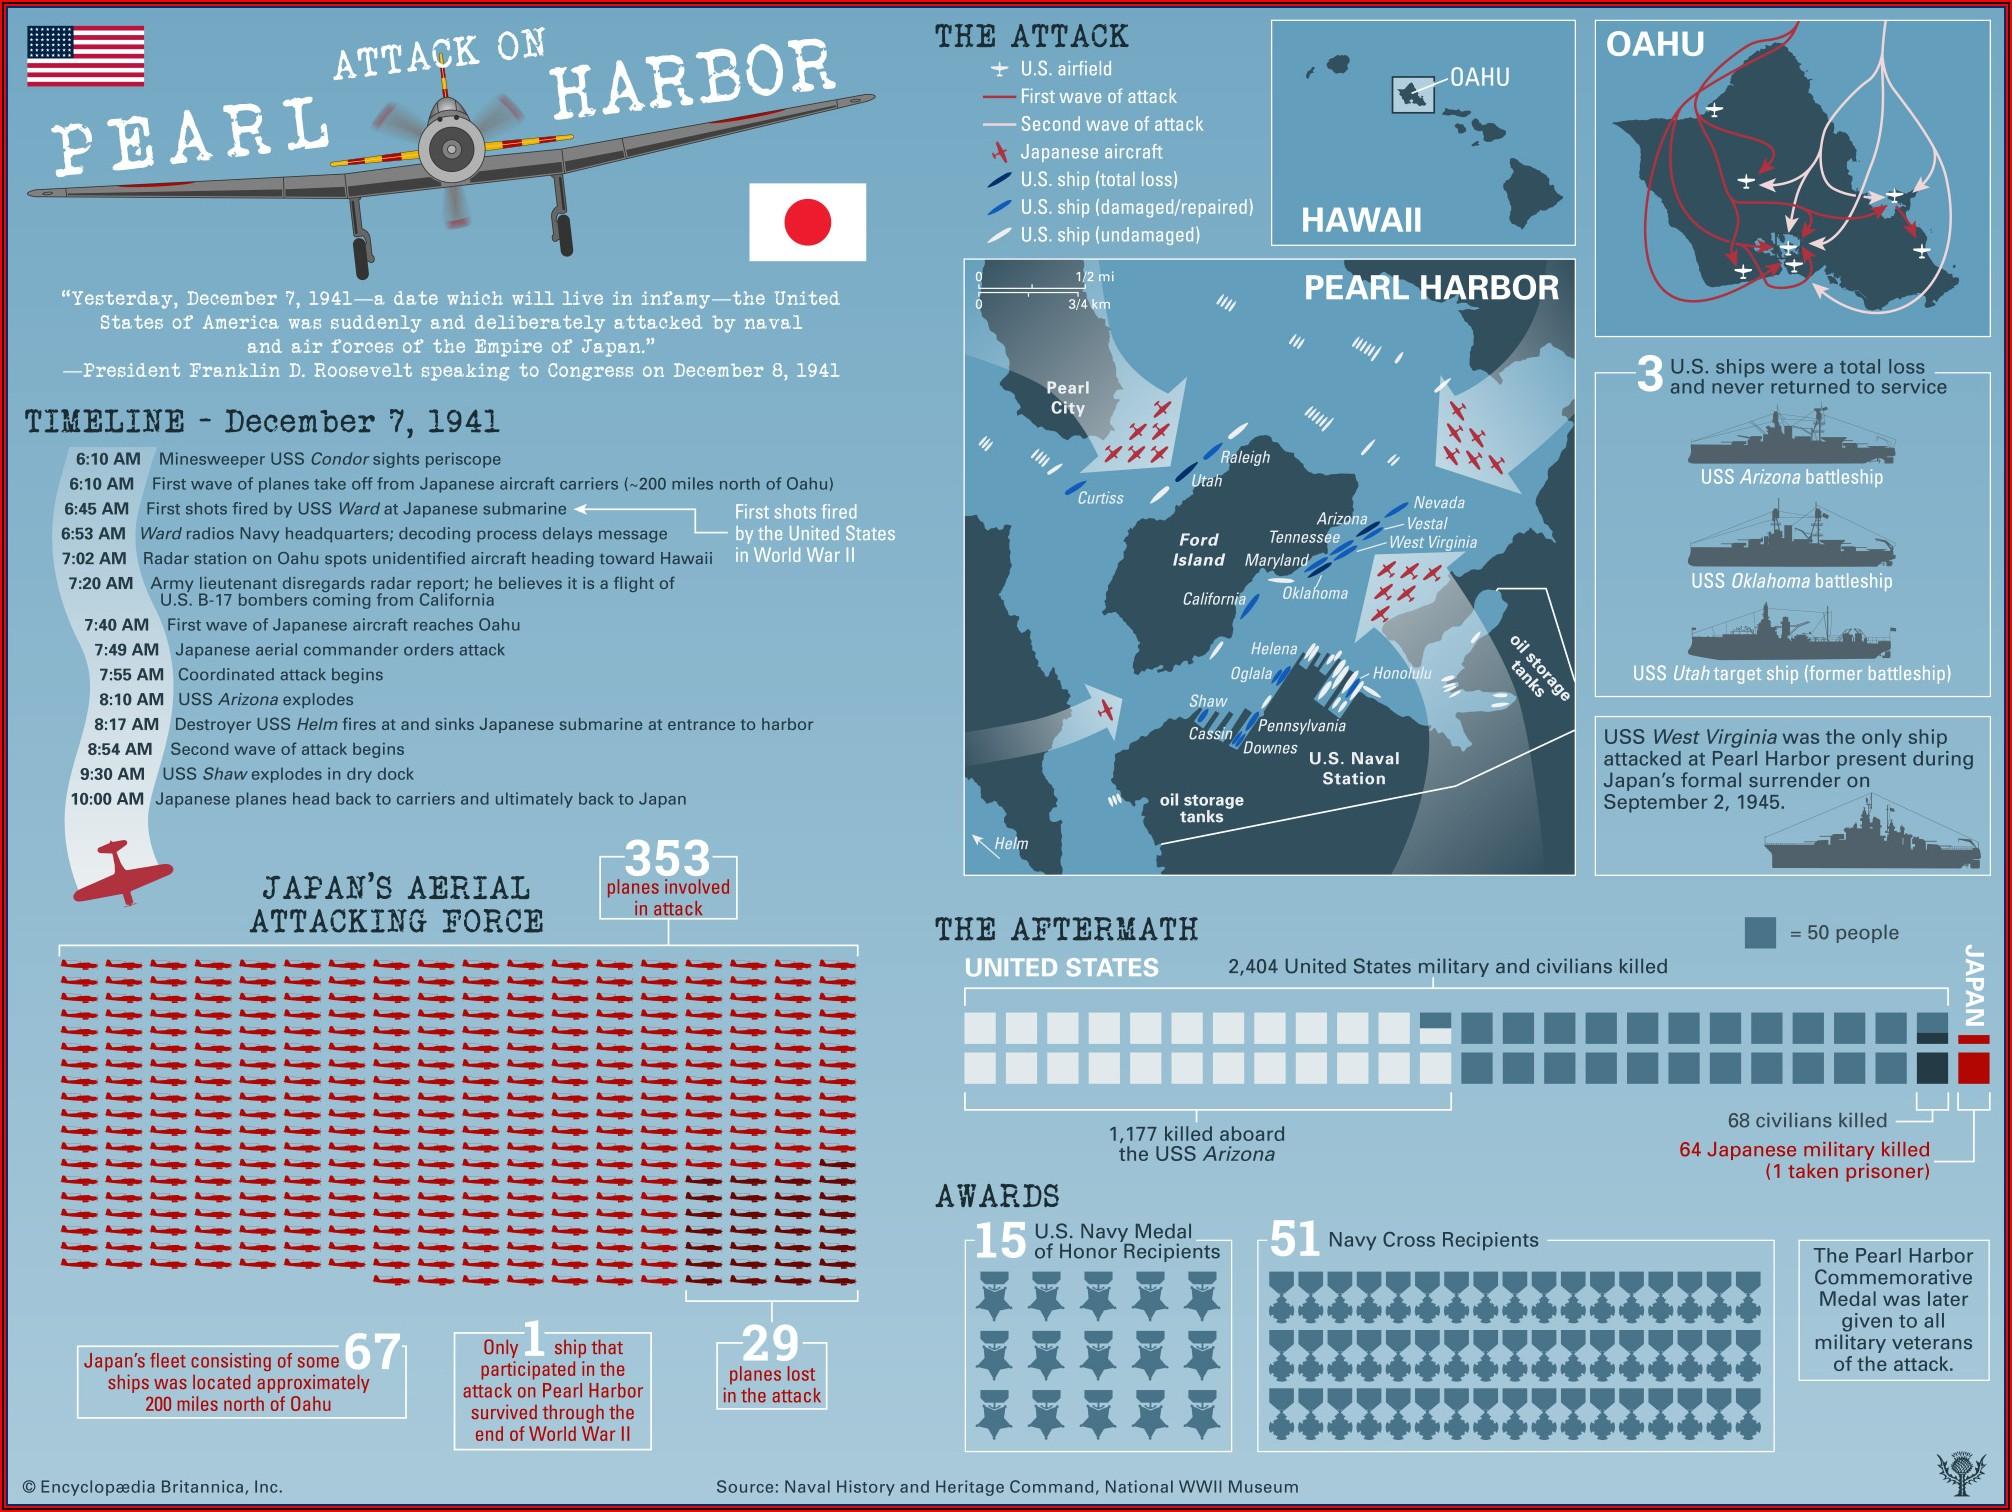 Pearl Harbor Attack Timeline